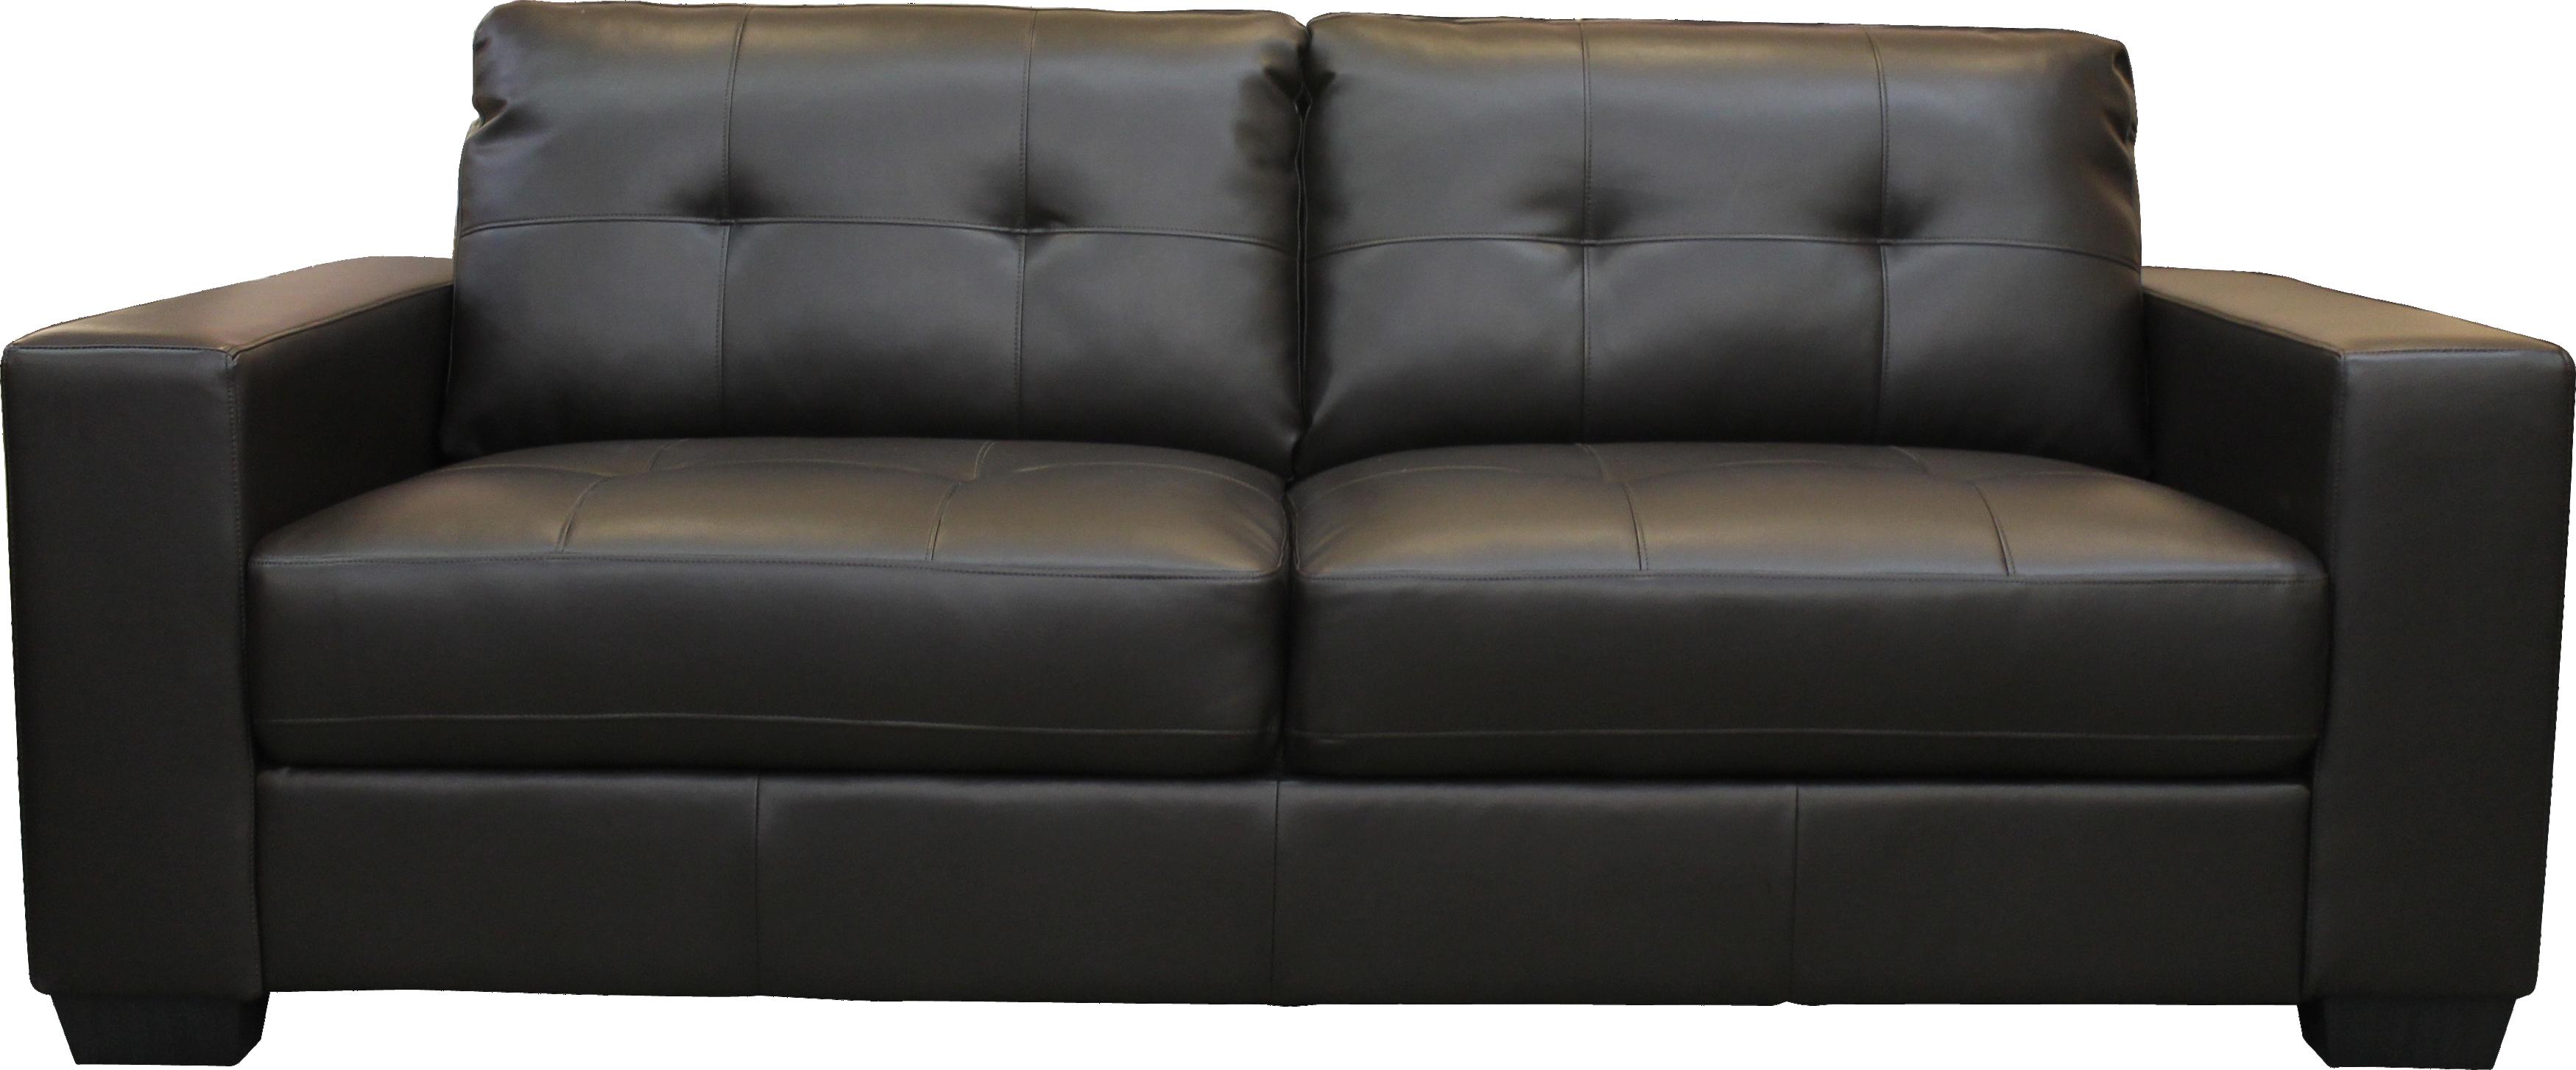 Sofa HD PNG